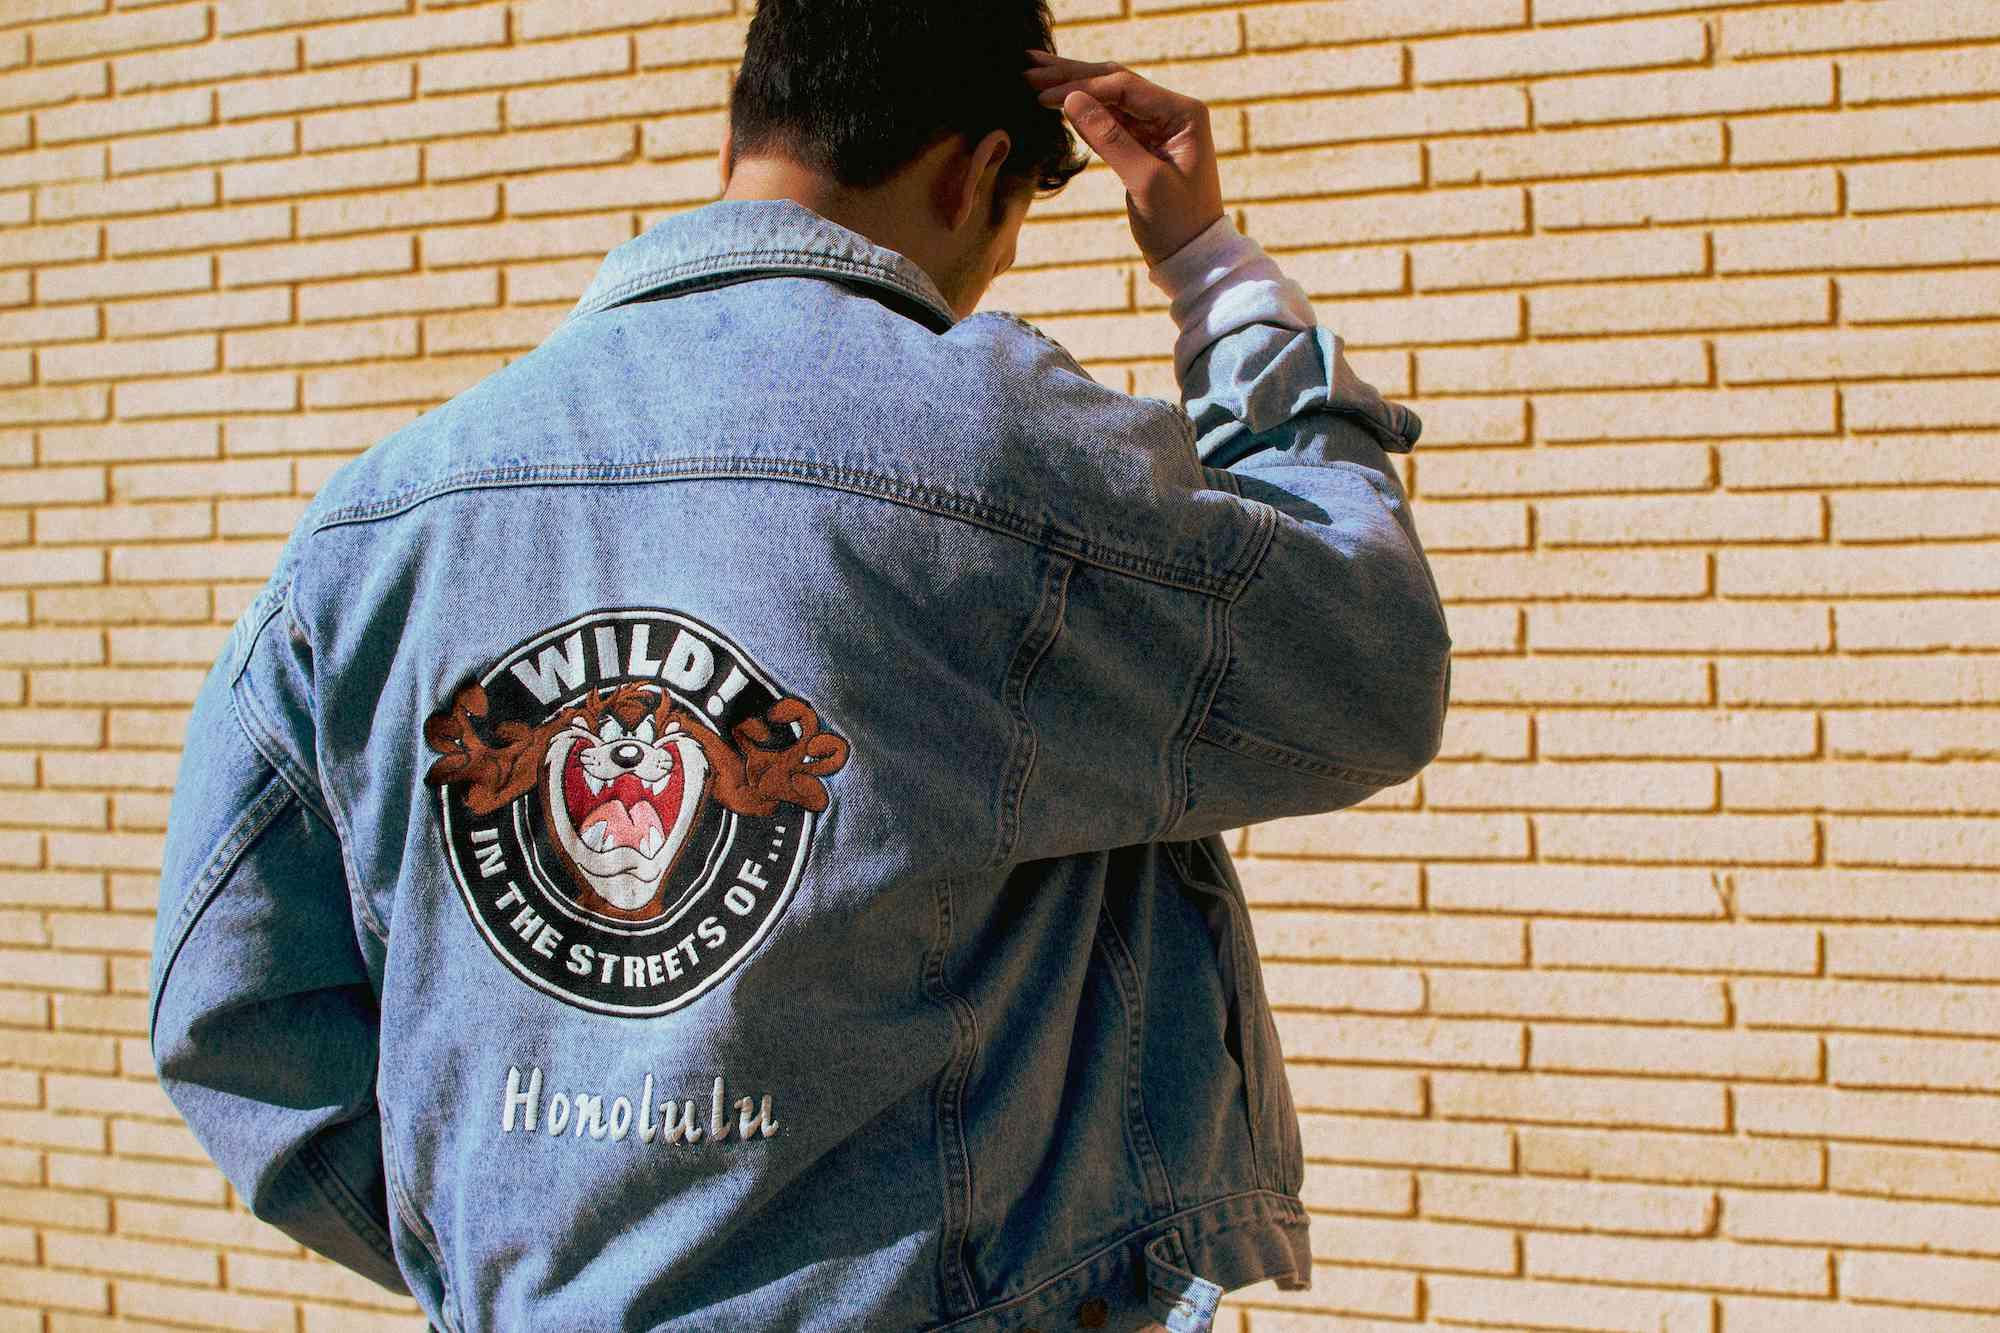 Nordstrom jacket back view